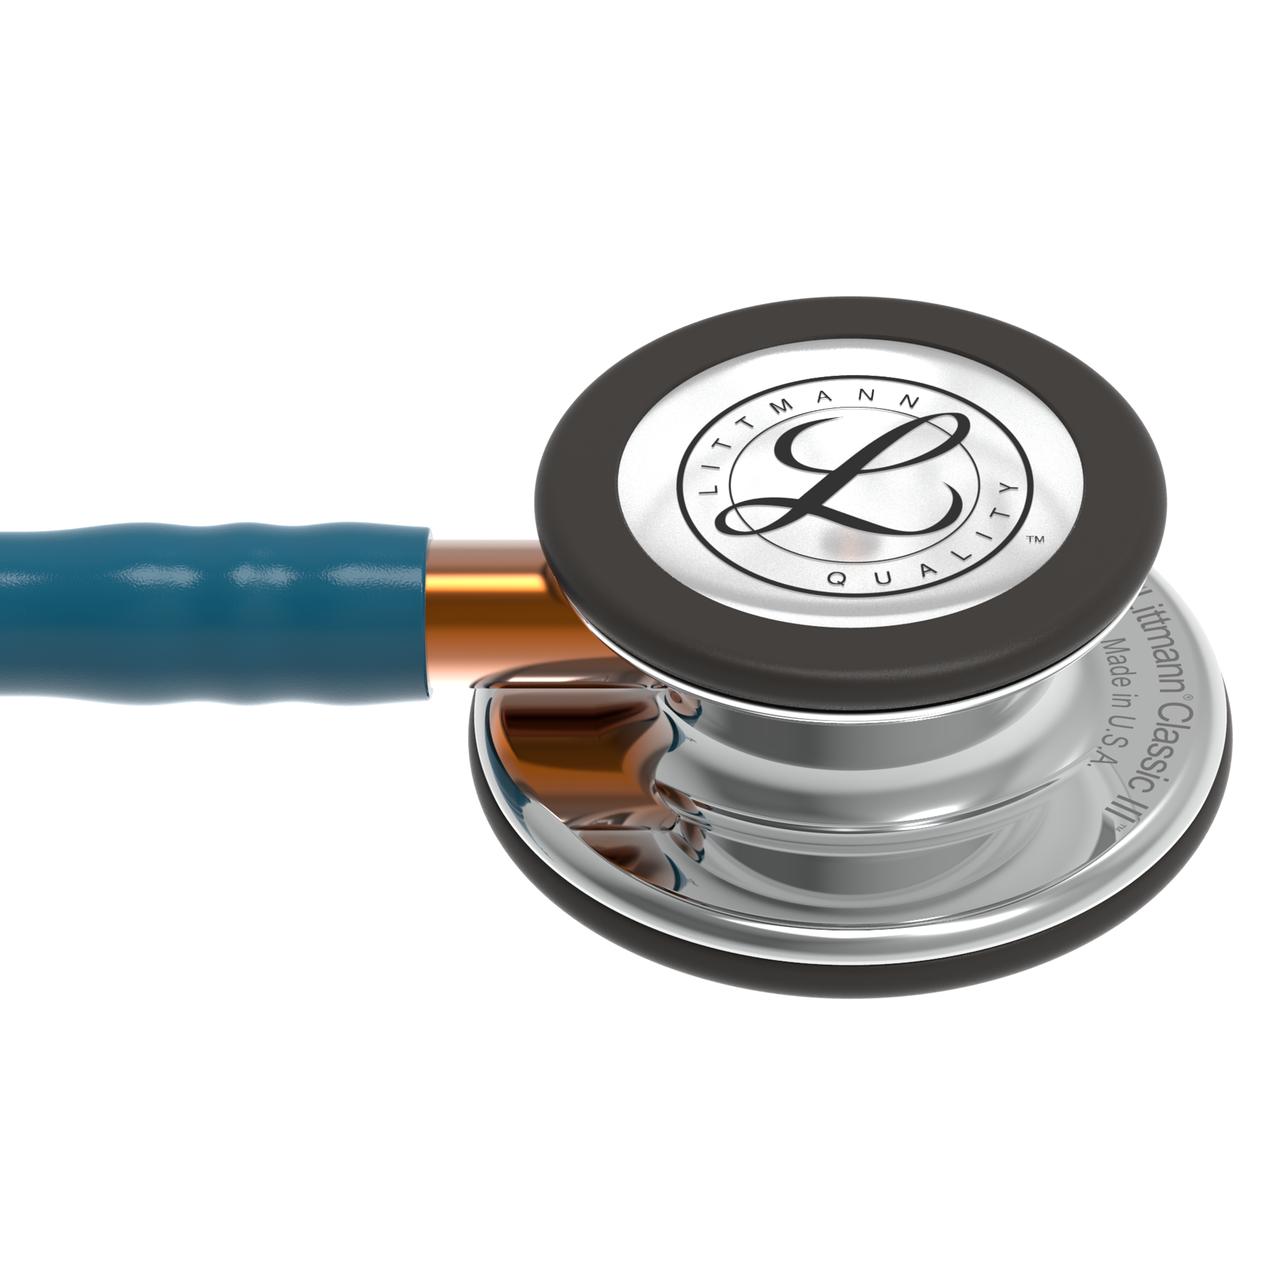 Littmann Classic III Stethoscope, Mirror Caribbean Orange, 5874